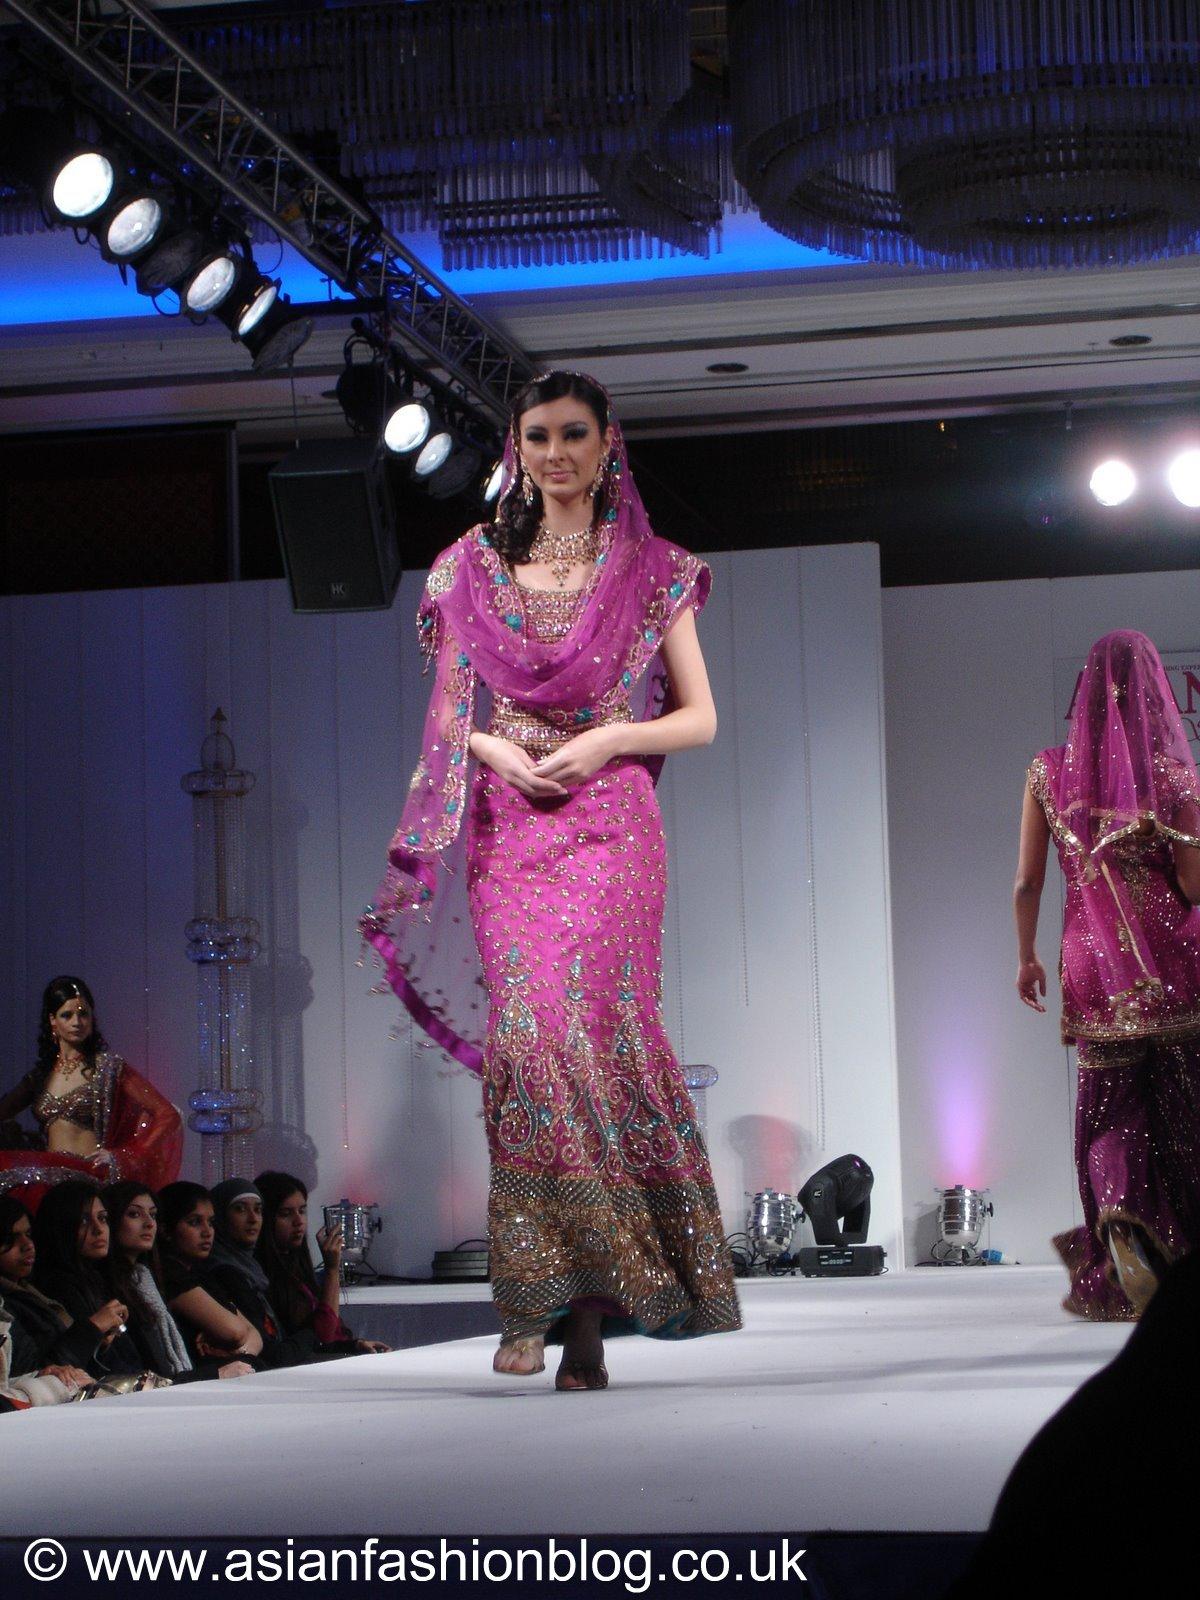 DSC05763 - Bridal Fashion Show......!!!!!!!!!!!!!!!!!